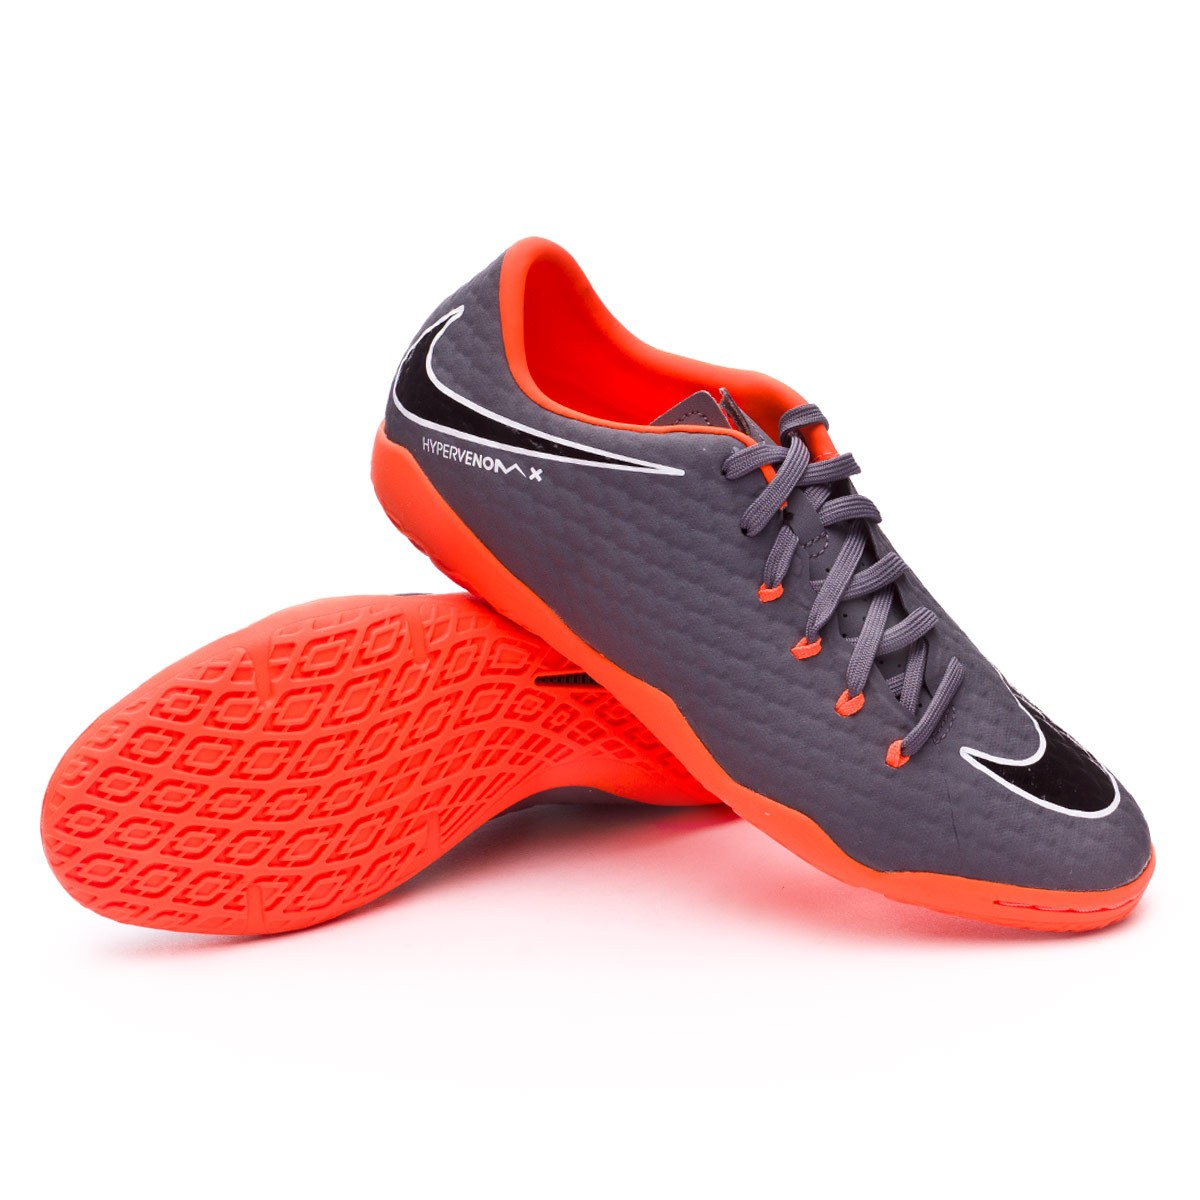 a450a8b74 Futsal Boot Nike Hypervenom PhantomX III Academy IC Dark grey-Total ...